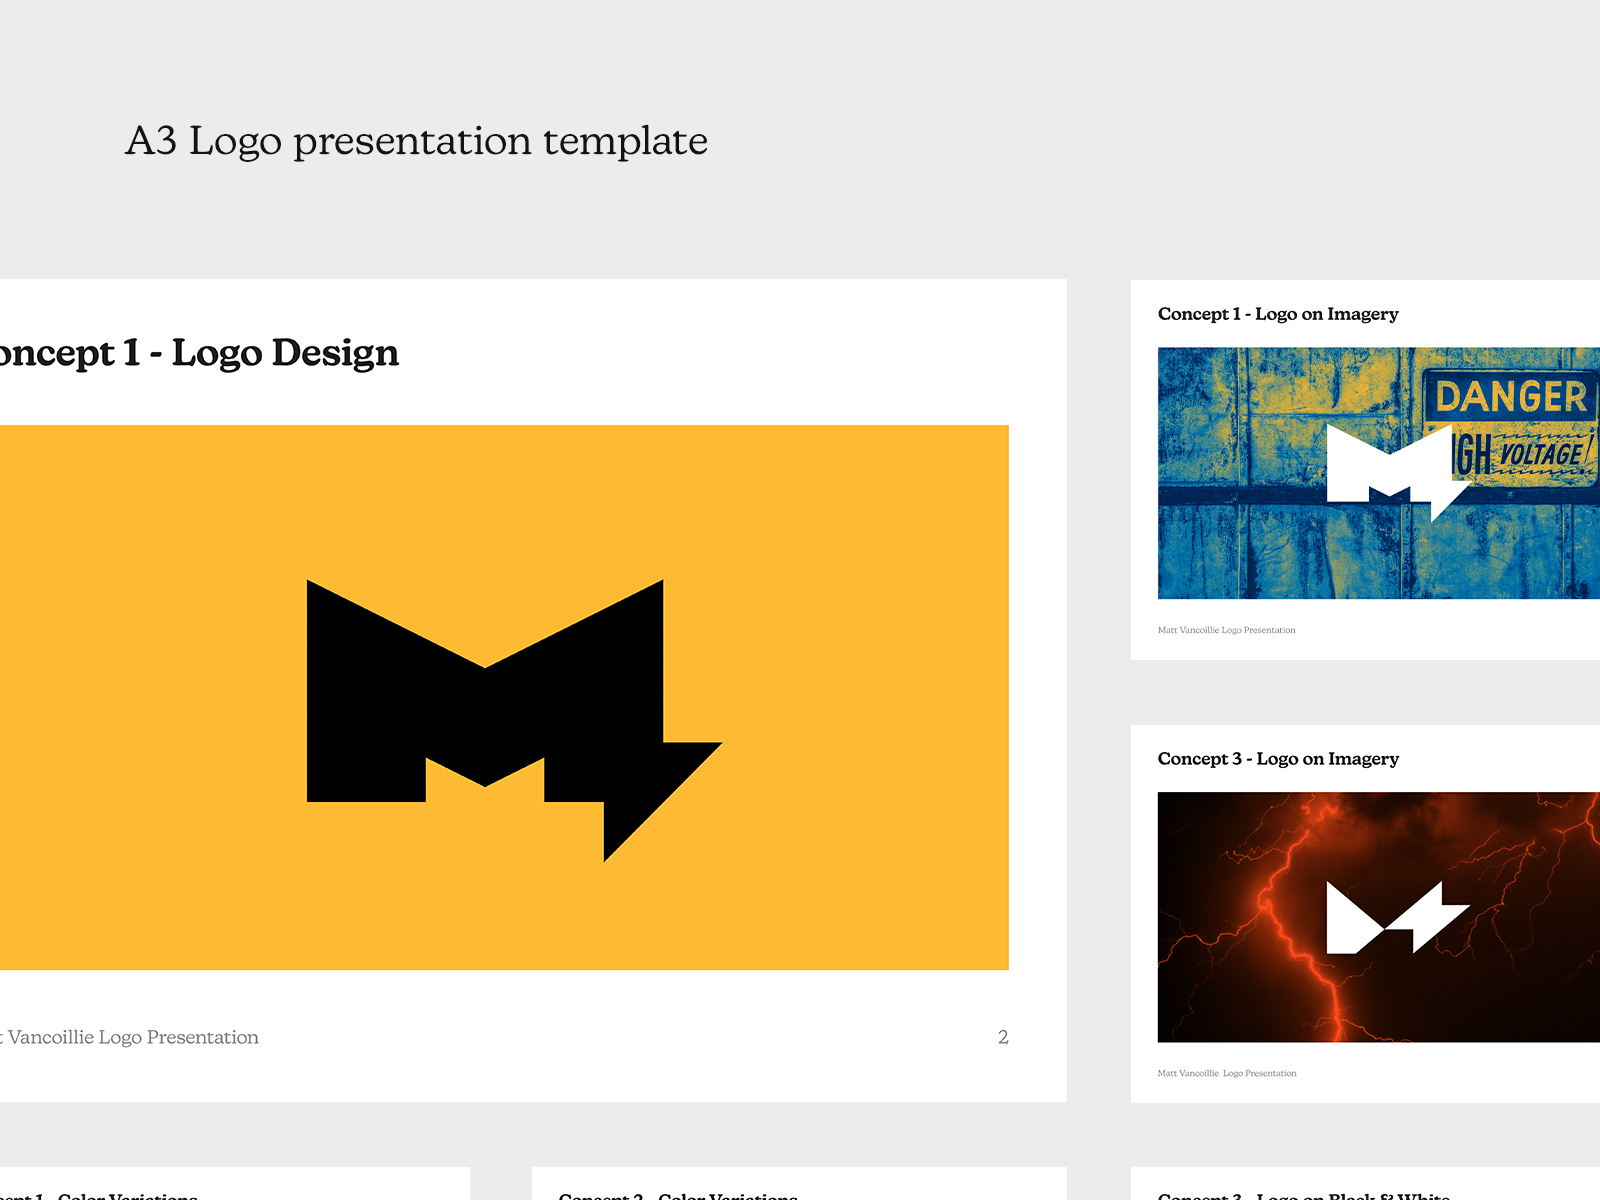 A3 Logo Presentation Template (Free)